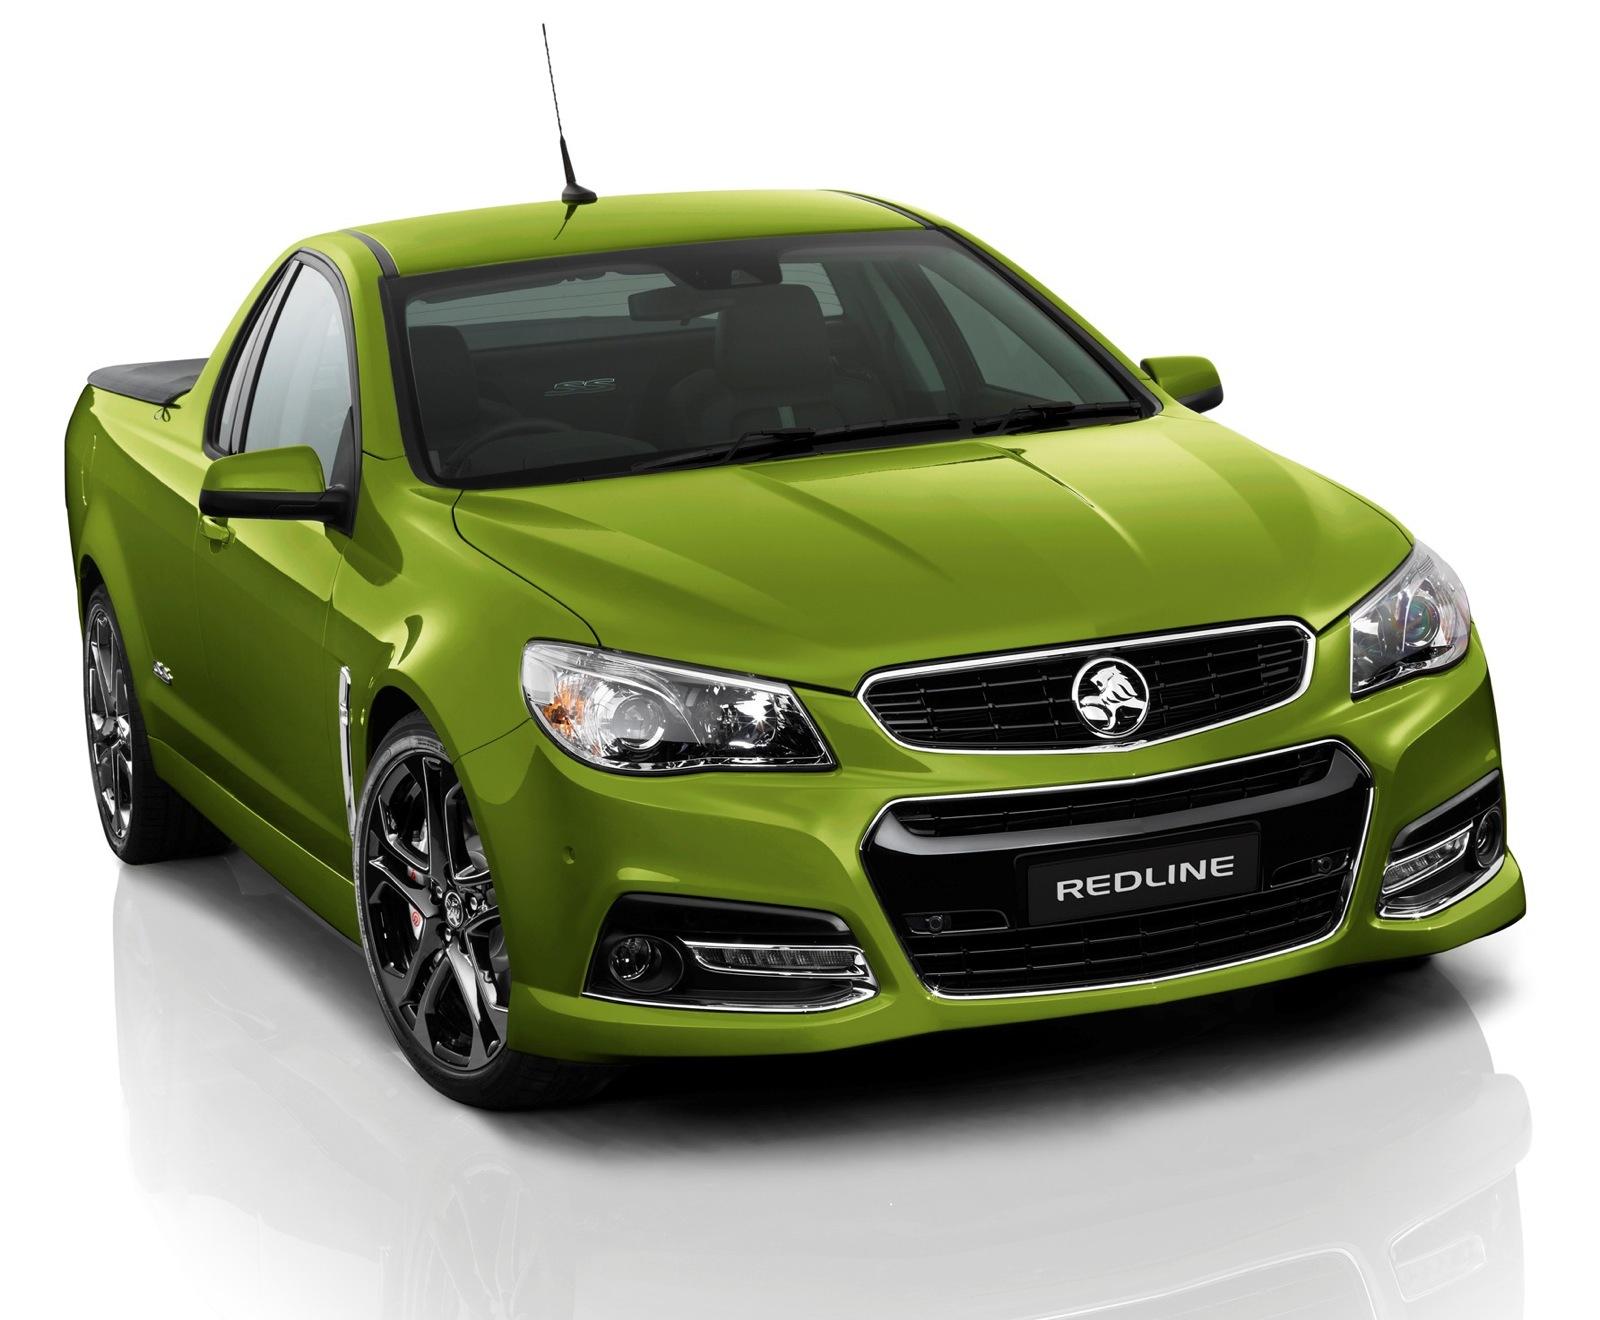 Nissan Juke 2019 >> 2015 Holden Commodore unveiled - photos | CarAdvice